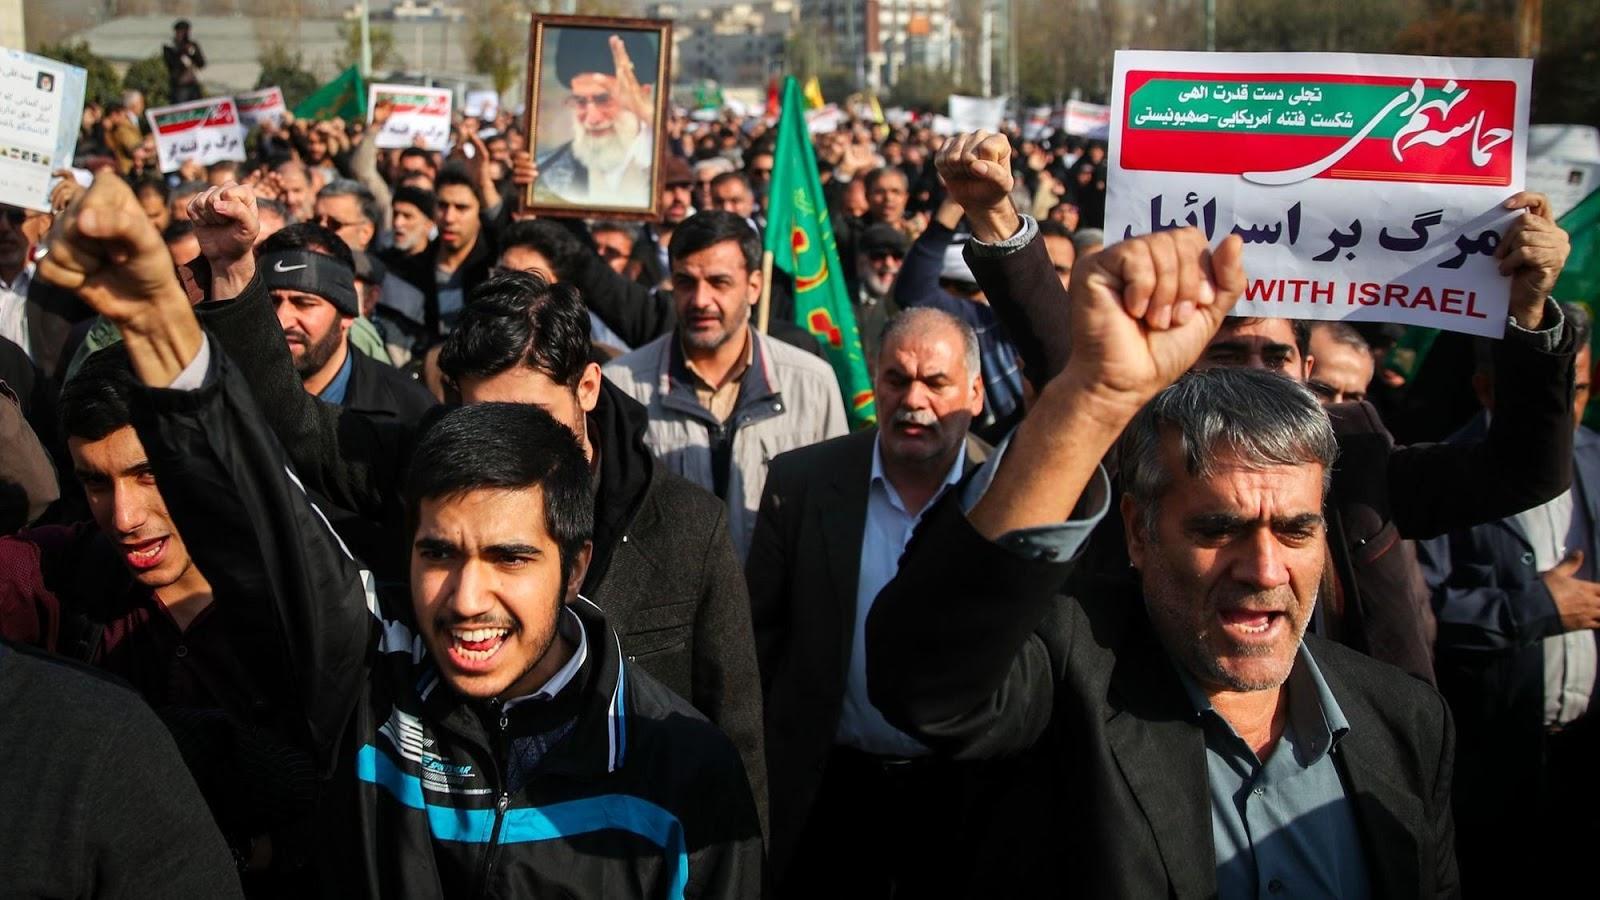 Iran blocks access to secure messaging app